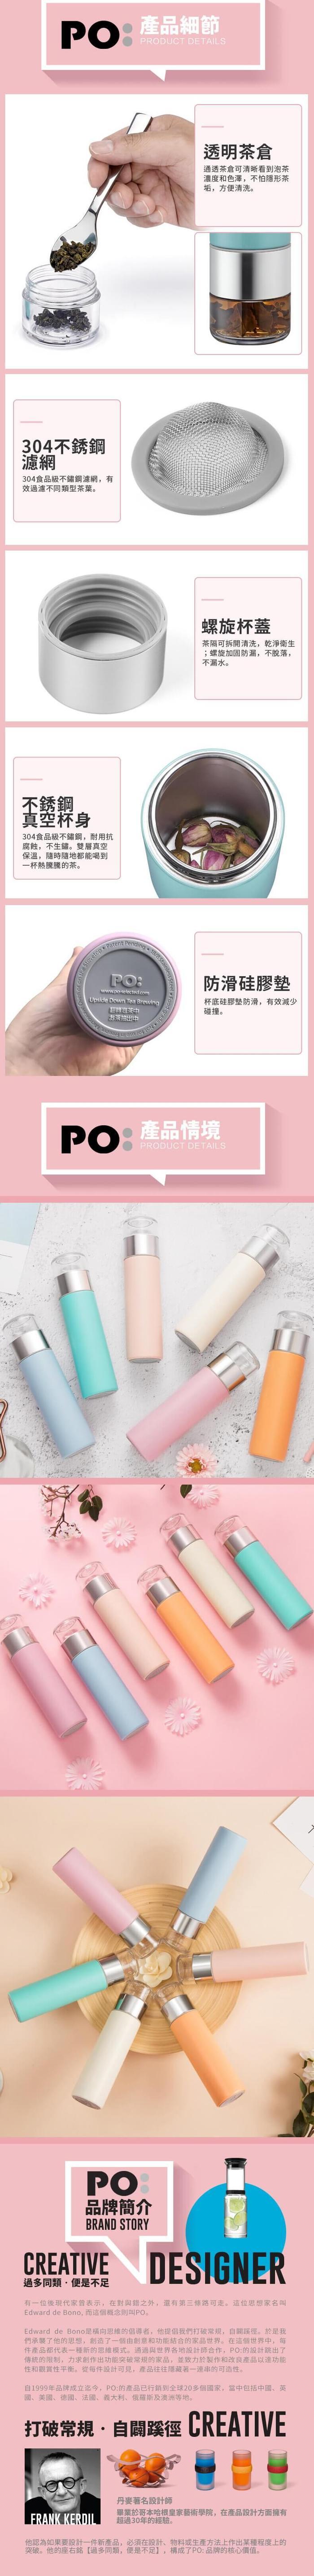 PO:Selected|攜帶式保溫泡茶杯240ml(桃粉)